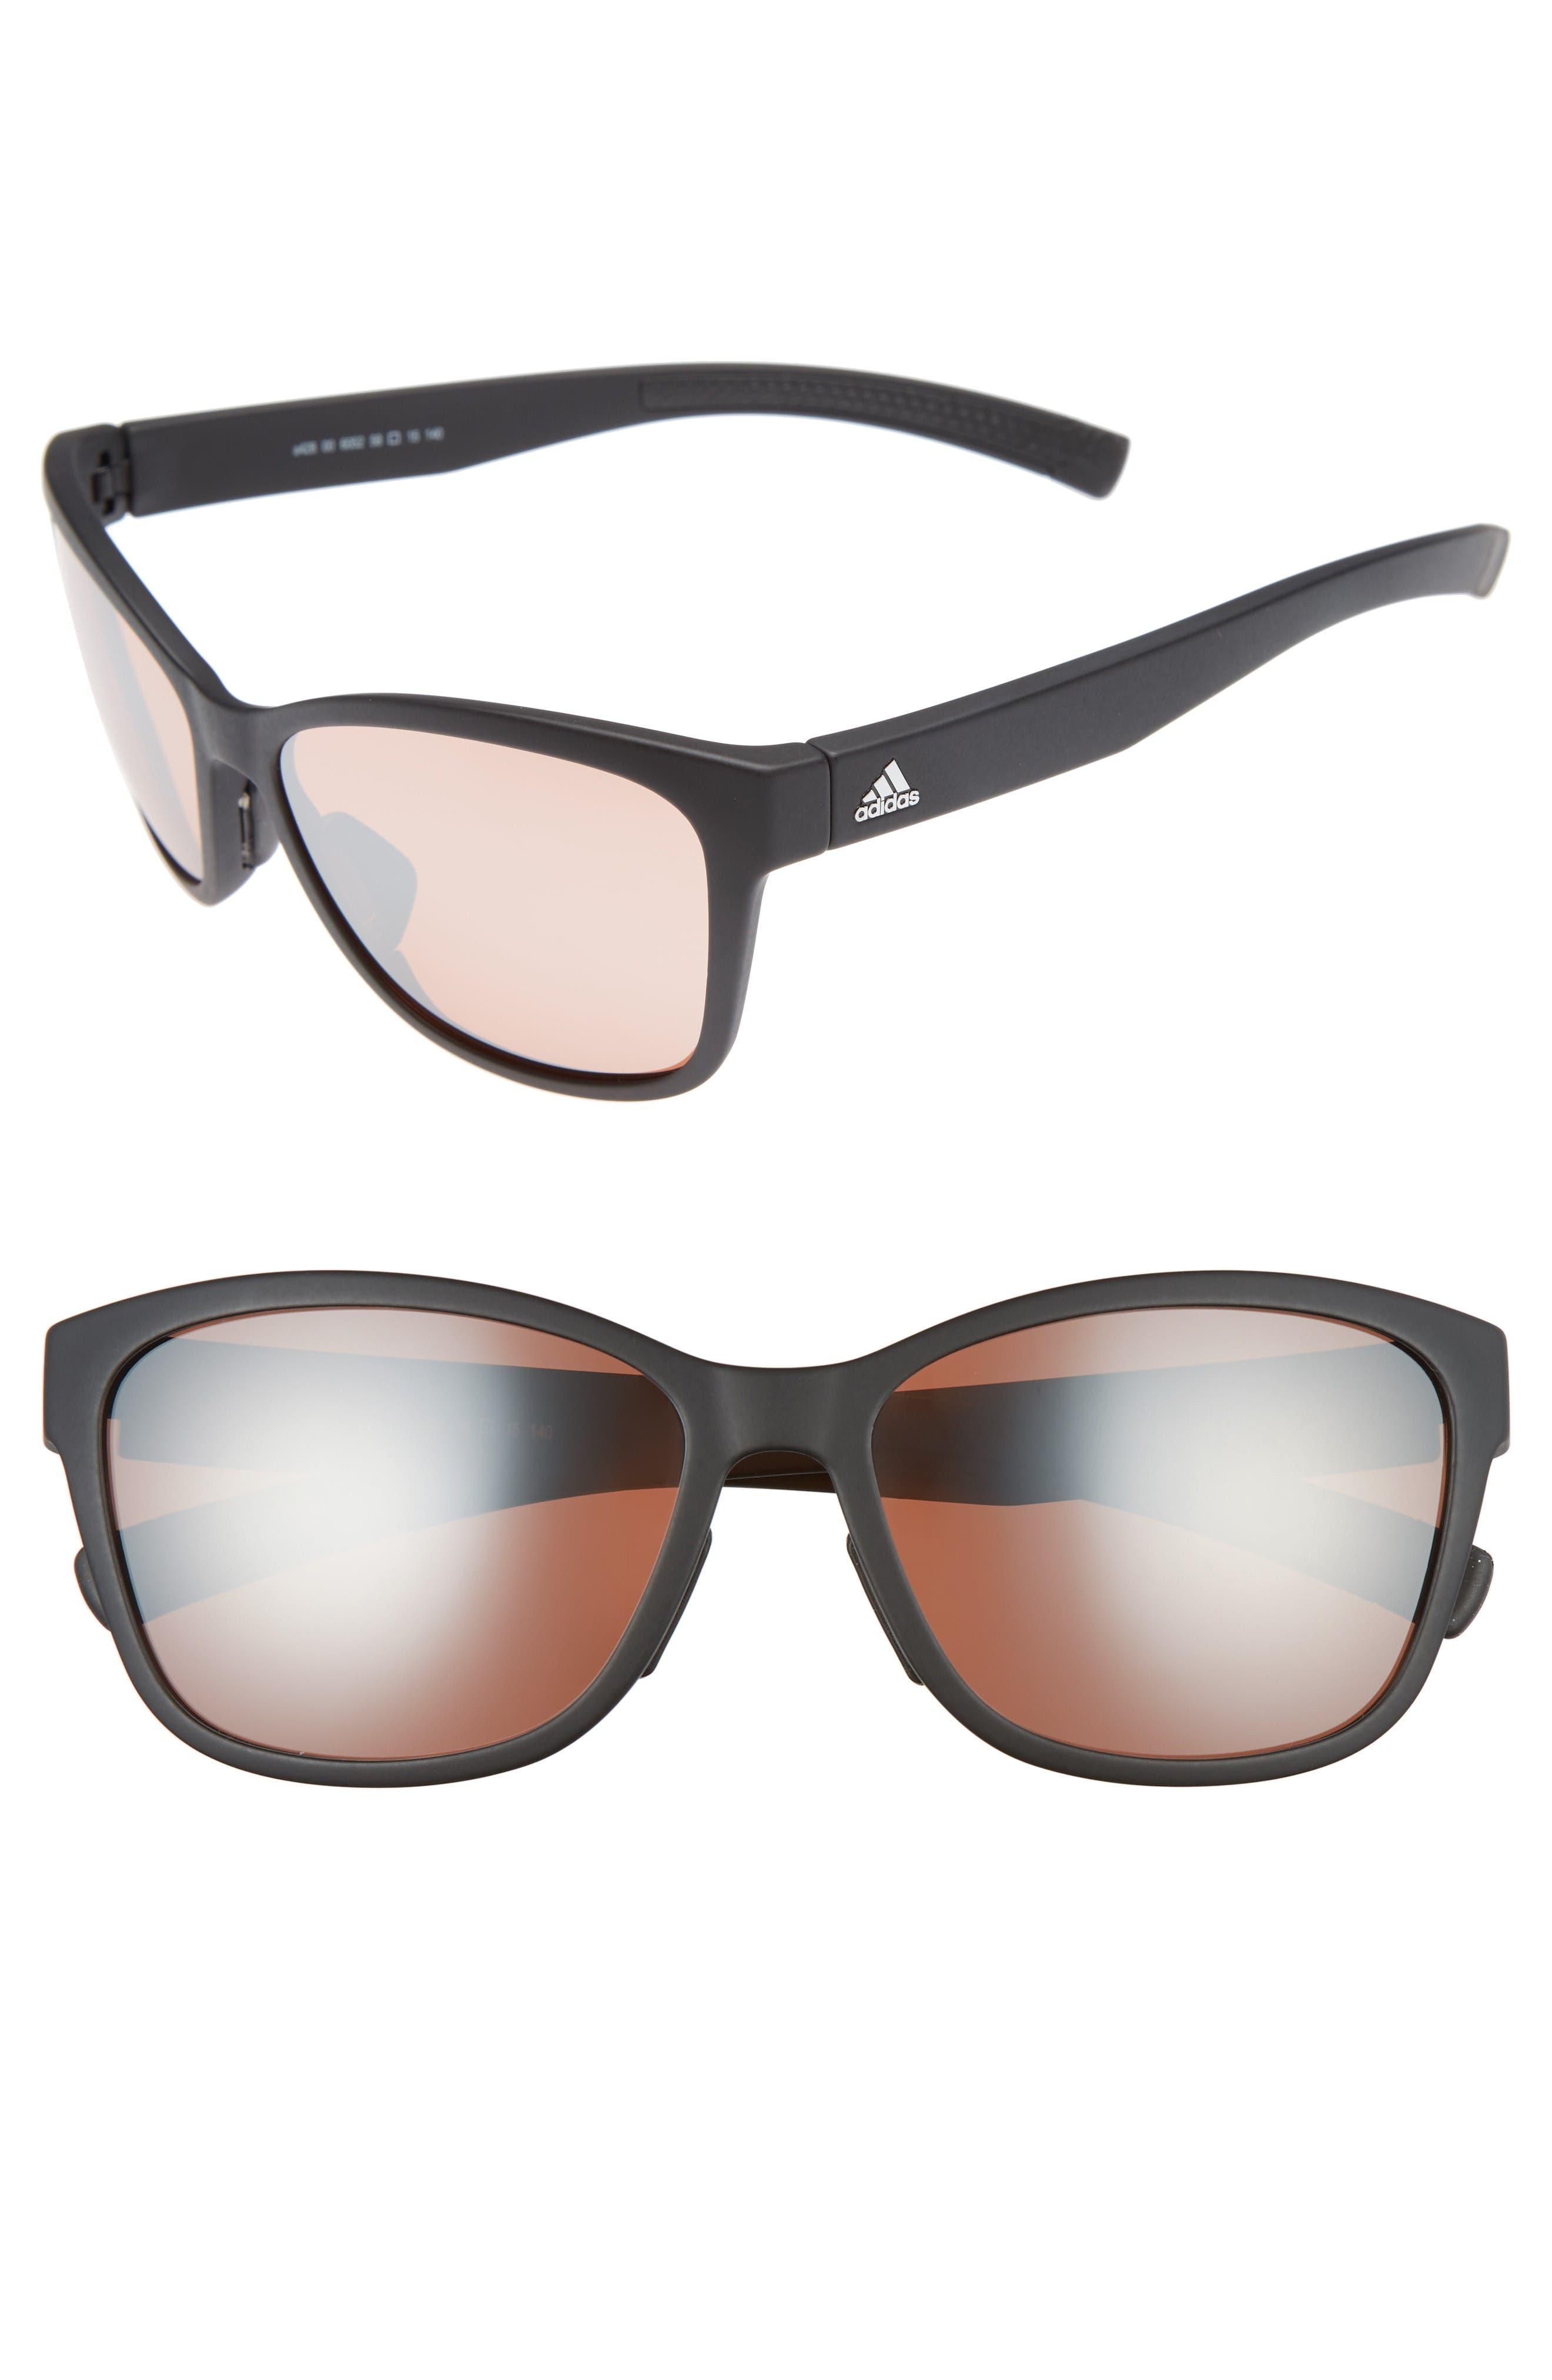 adidas Excalate 58mm Mirrored Sunglasses